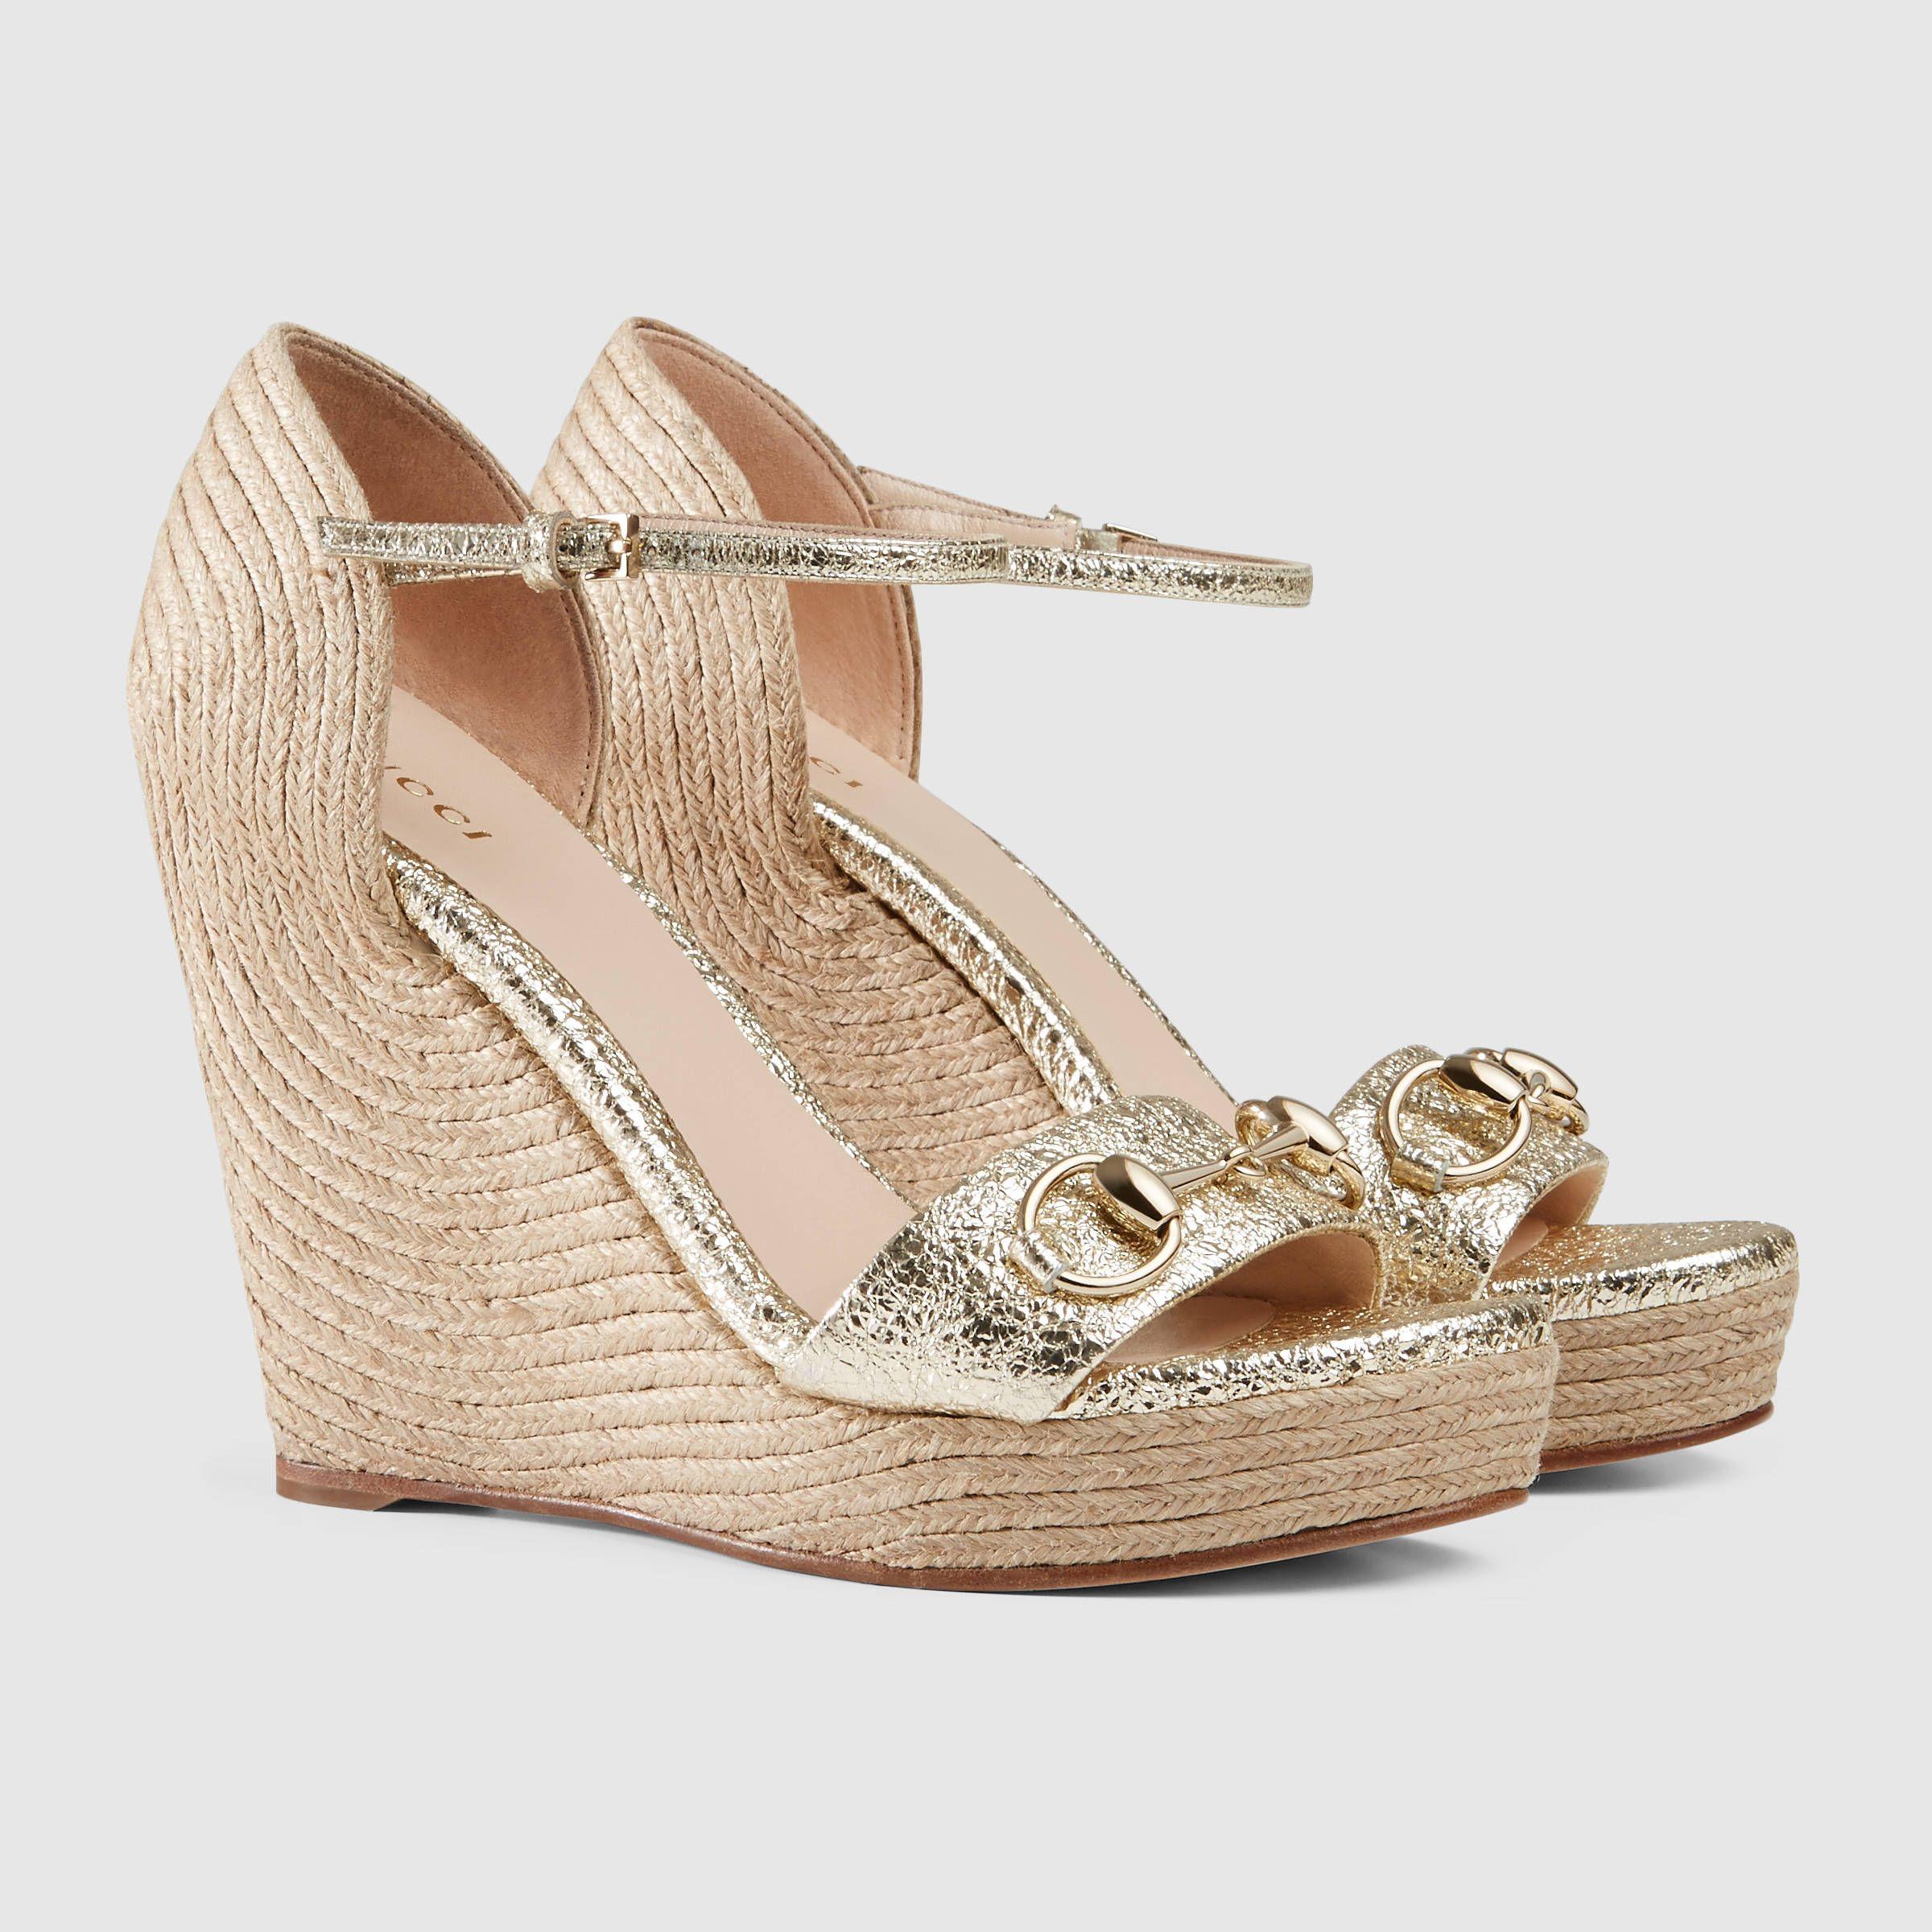 f4f02707464 Gucci Women - Gucci Metallic Laminate Leather Horsebit suede wedges -   650.00